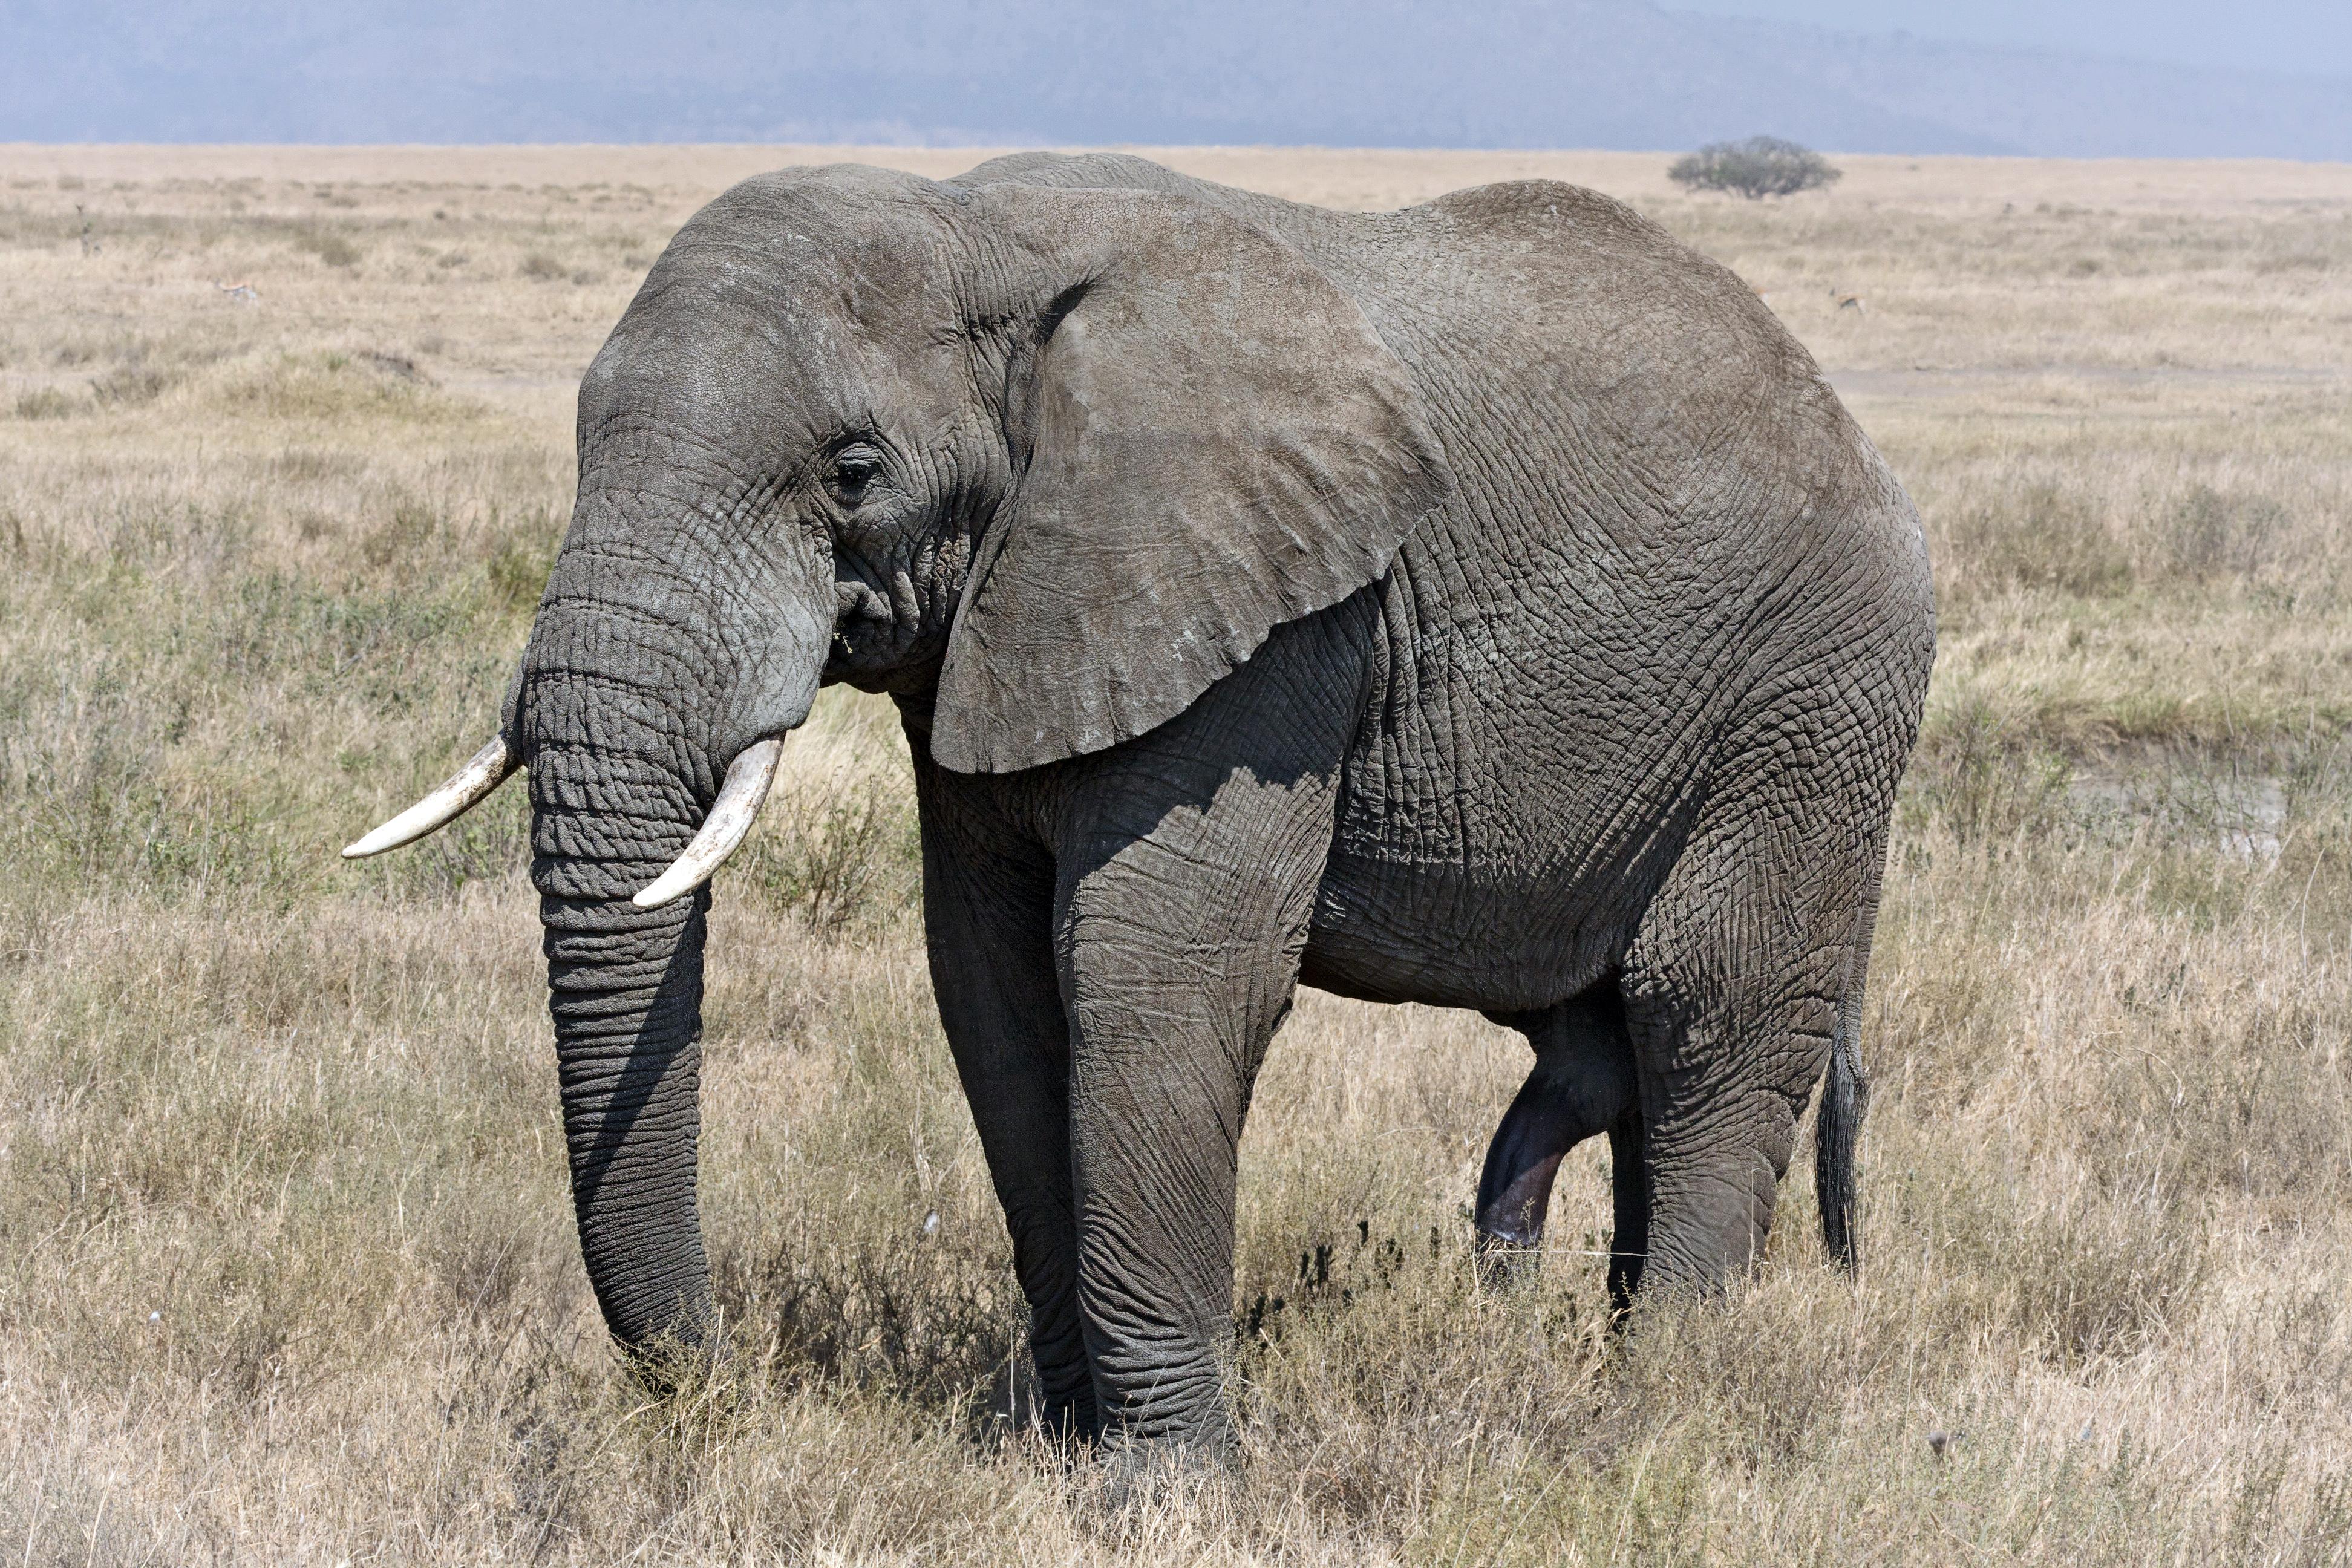 https://upload.wikimedia.org/wikipedia/commons/5/59/Serengeti_Elefantenbulle.jpg